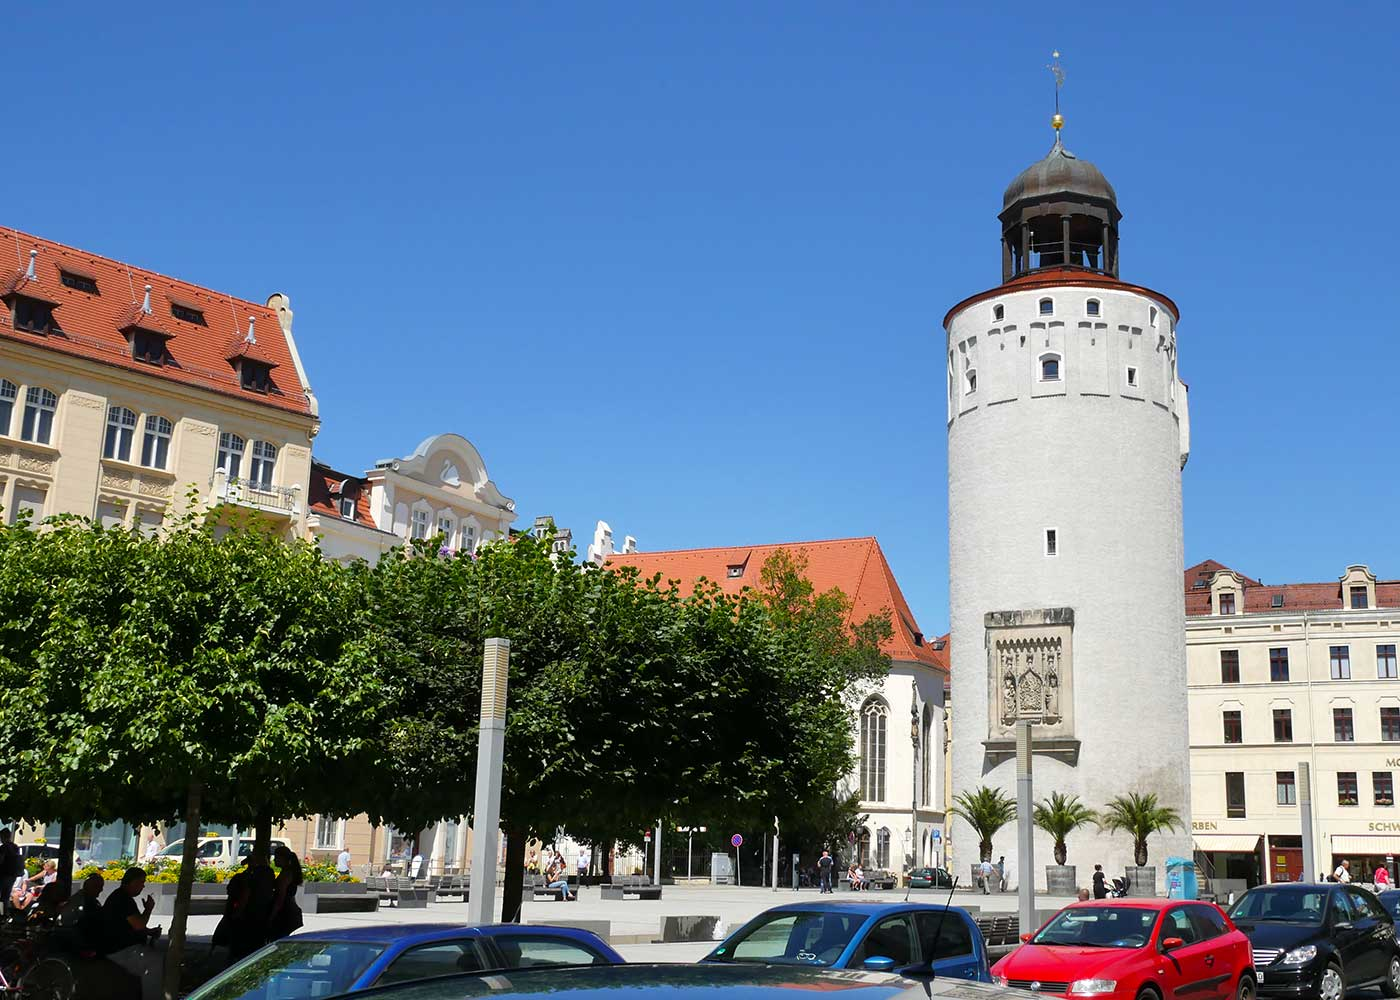 Frauenturm oder Dicker Turm